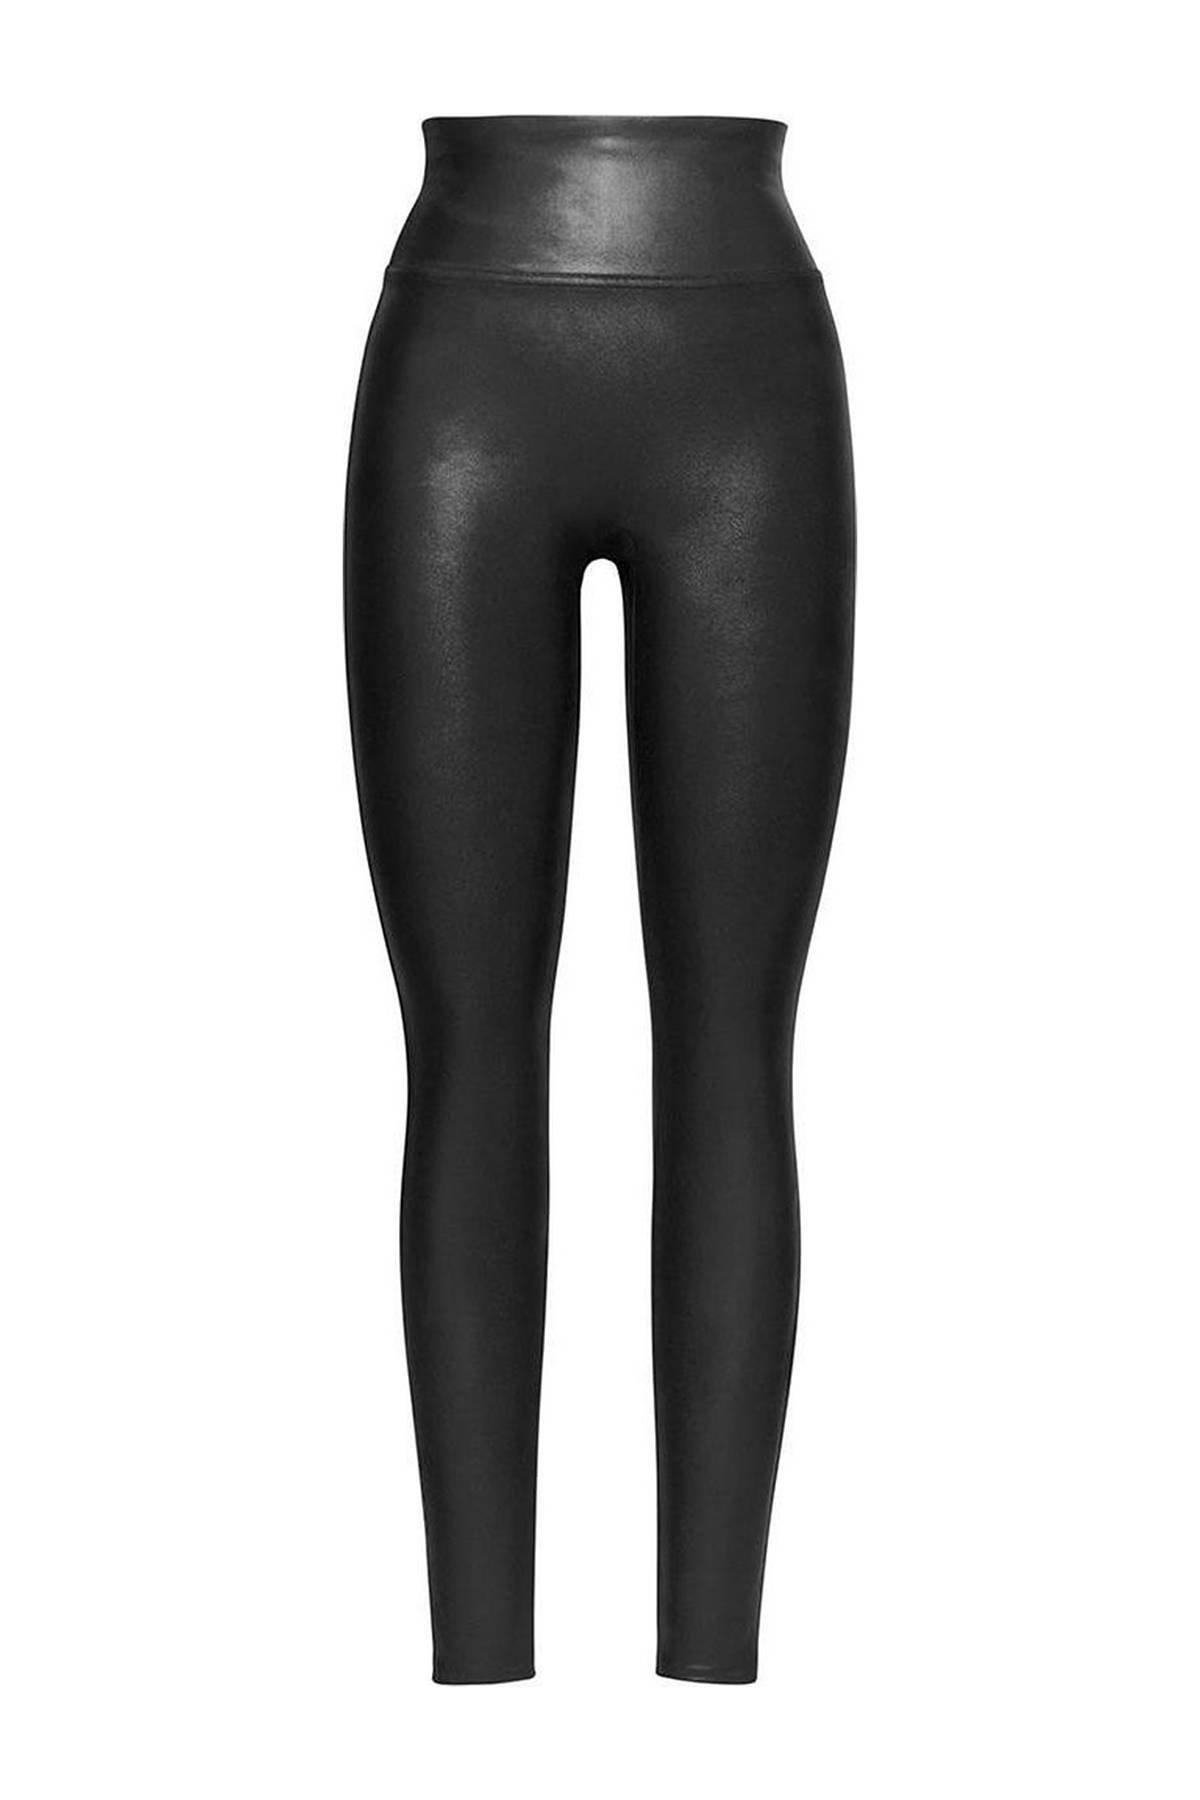 corrigerende legging Faux Leather zwart